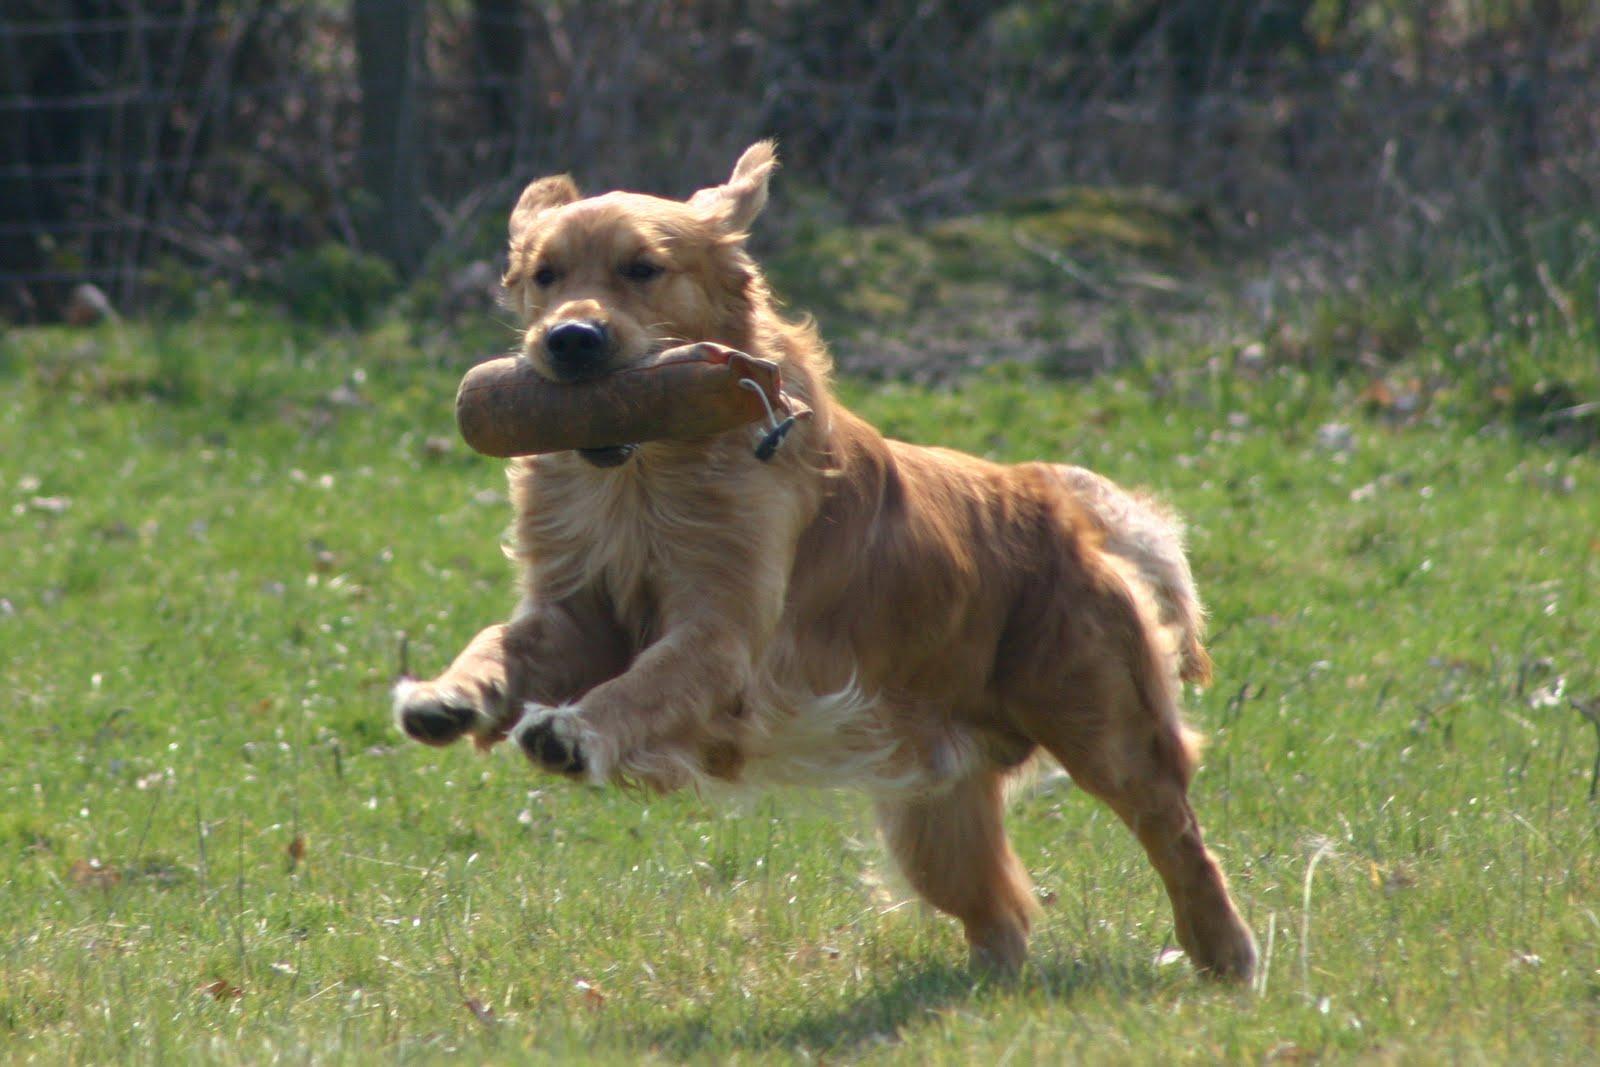 http://1.bp.blogspot.com/--bEqHesvdv8/Th8LetzdEtI/AAAAAAAAAEw/XS18q2V3dc8/s1600/Retrievers+Dogs+Wallpapers+4.jpg